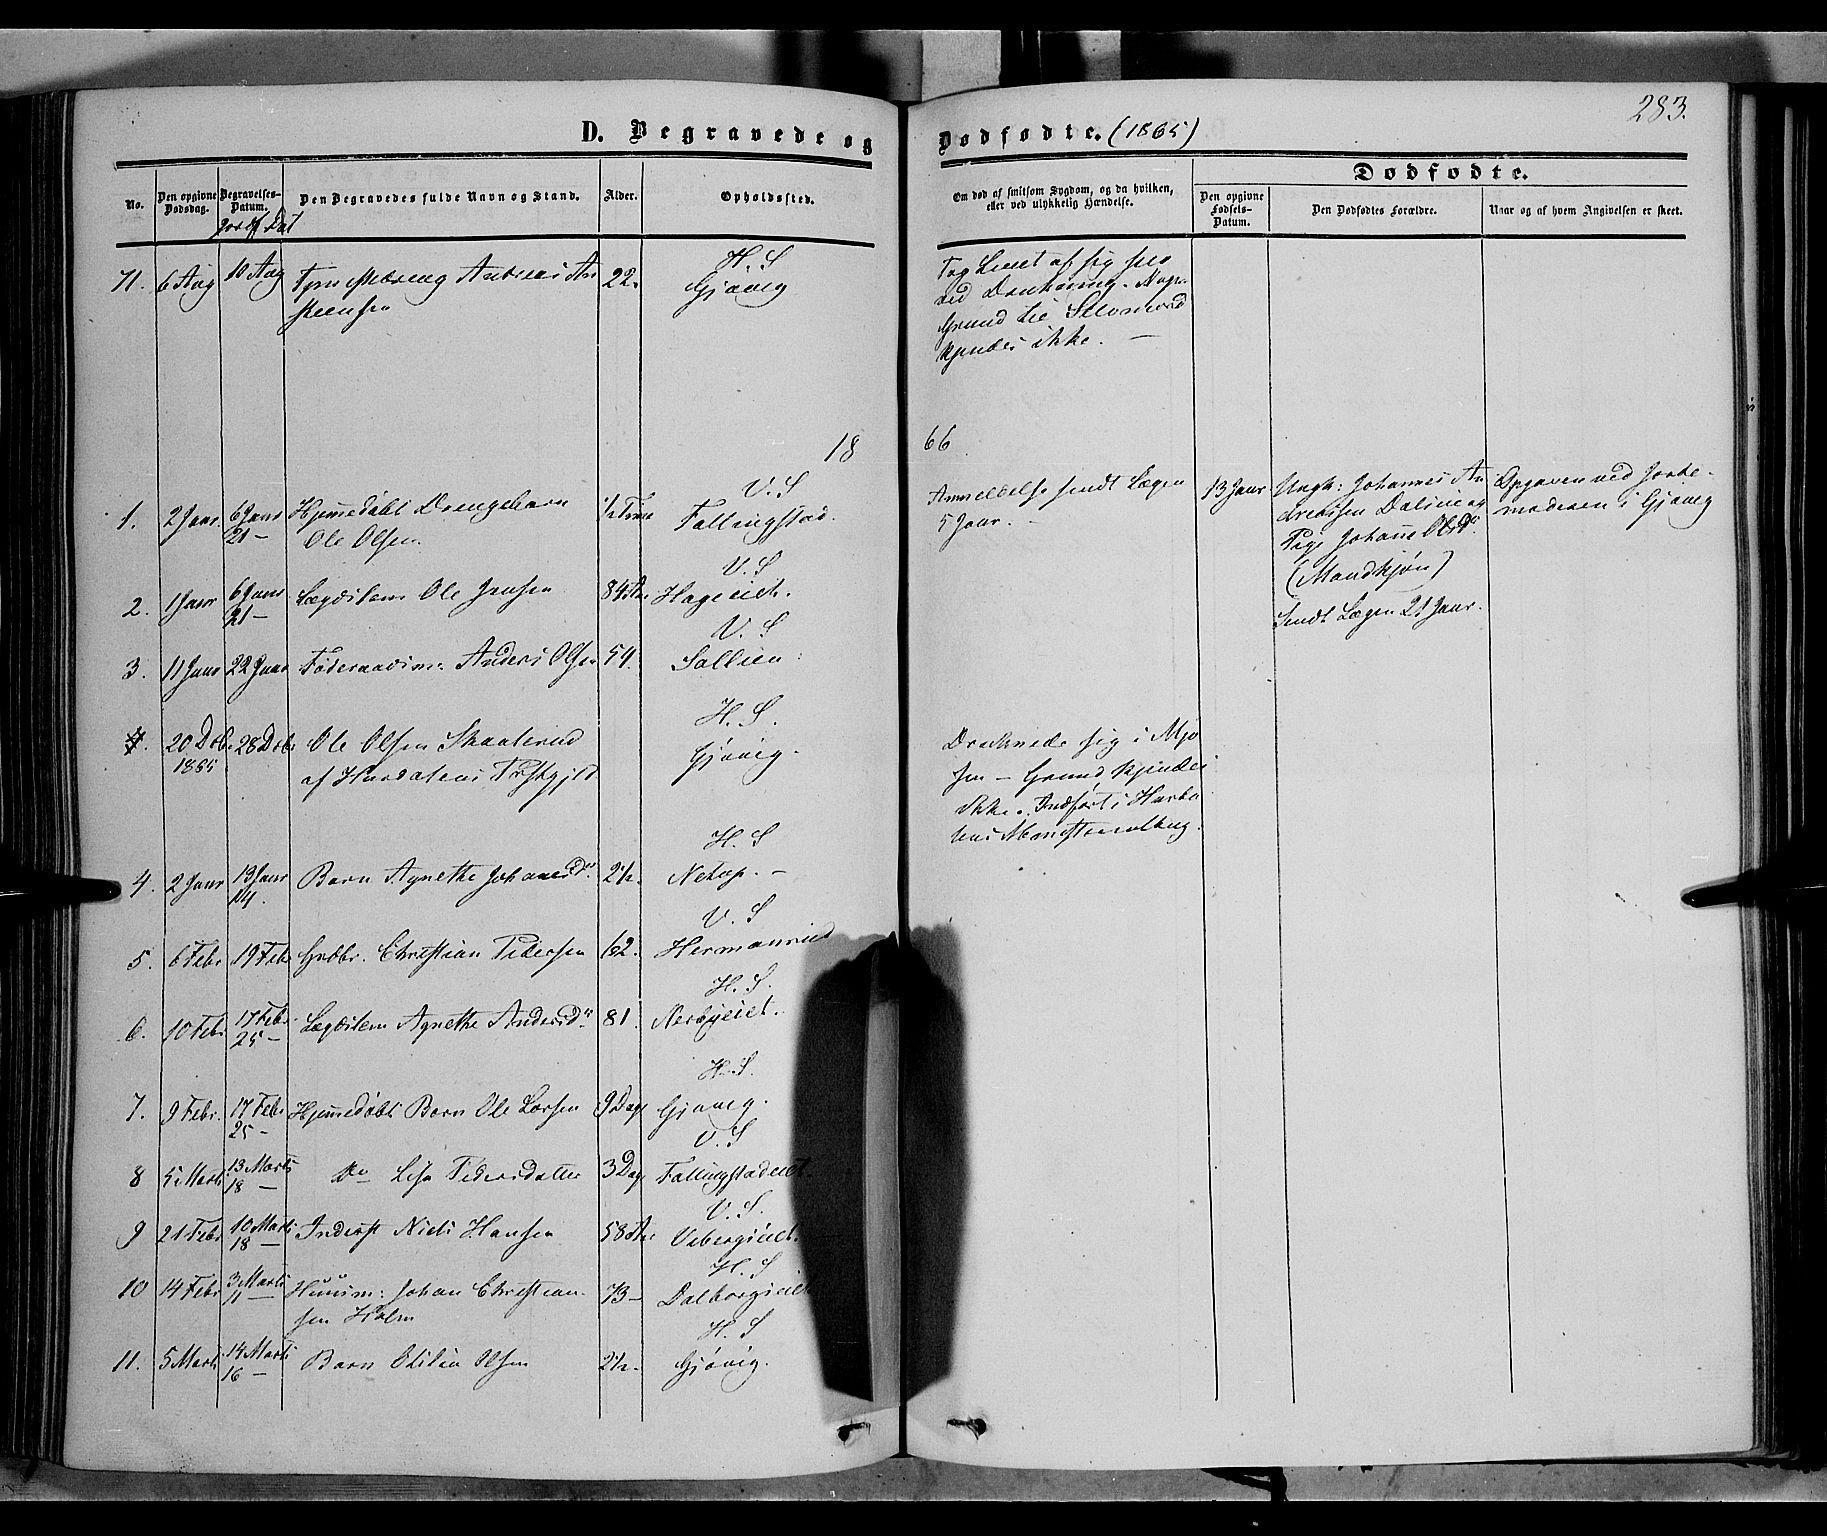 SAH, Vardal prestekontor, H/Ha/Haa/L0006: Ministerialbok nr. 6, 1854-1866, s. 283